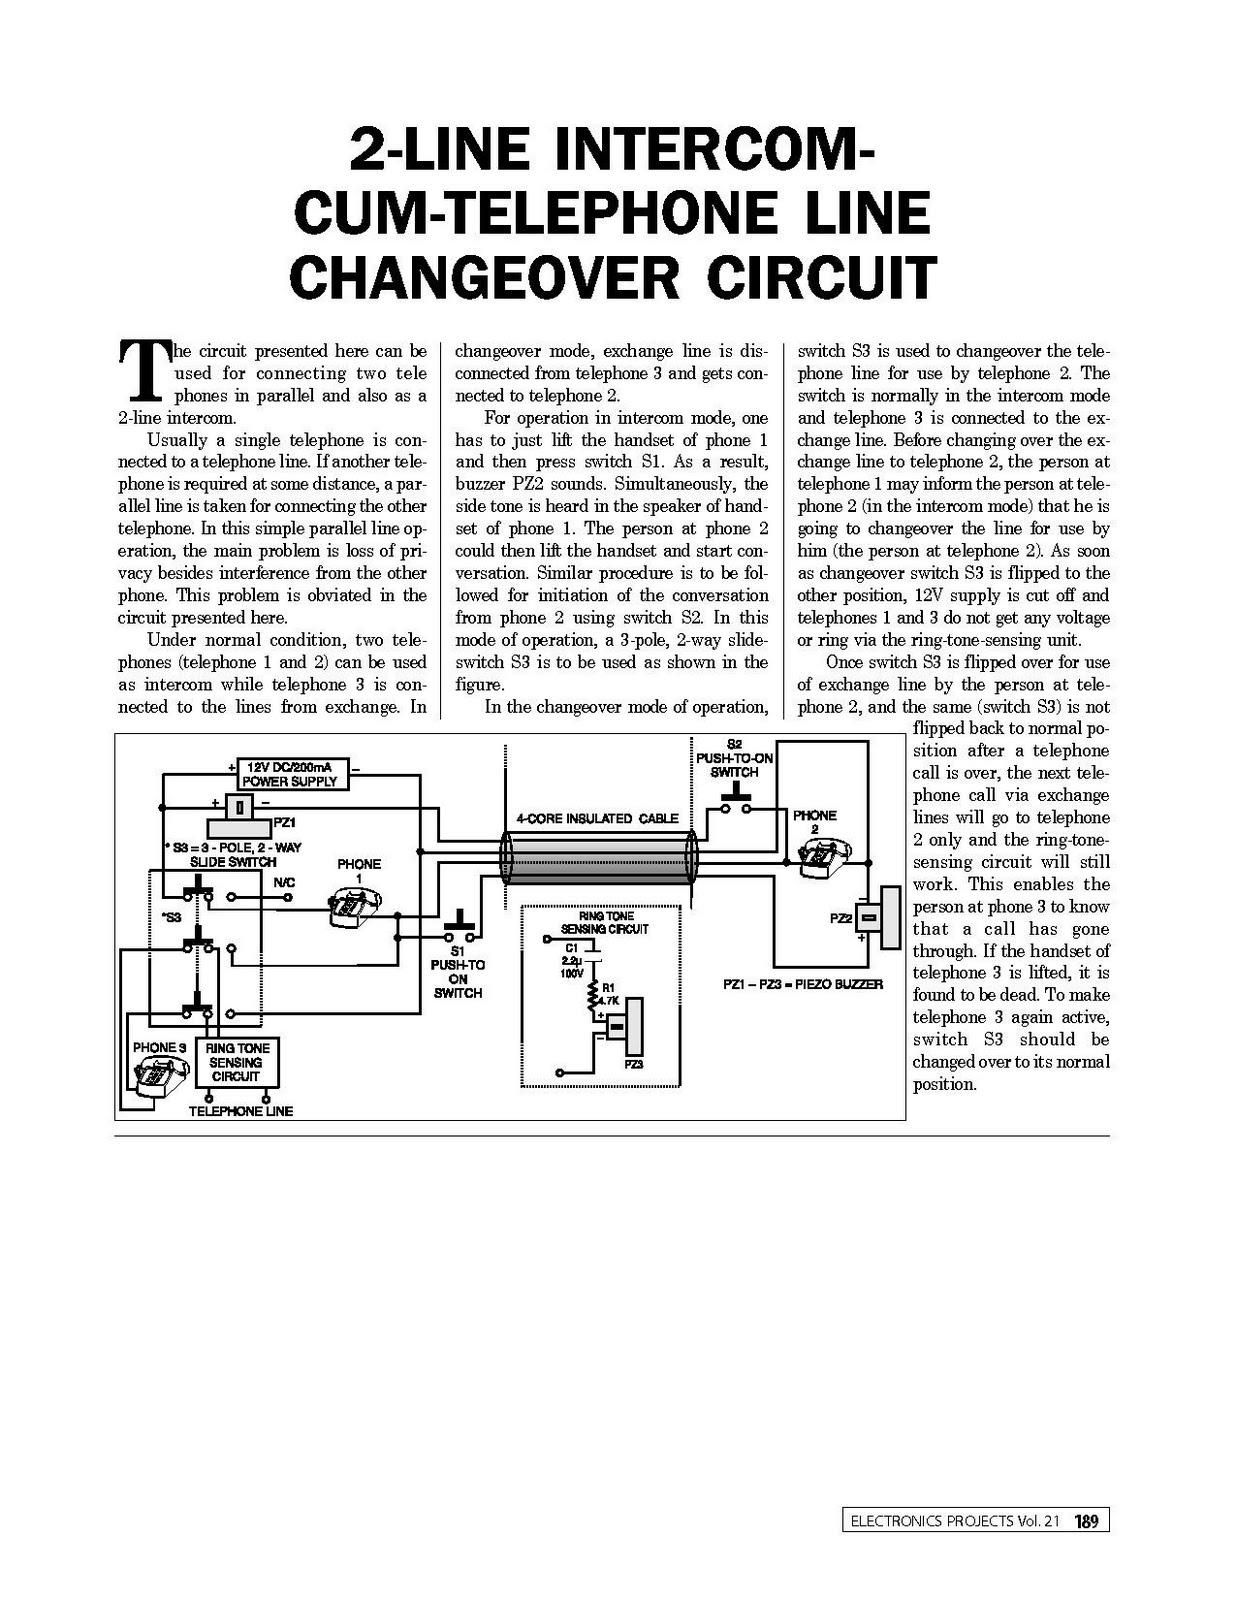 Sound Powered Telephone Wiring Diagram Line Intercom Cum Changeover Circuit 1236x1600